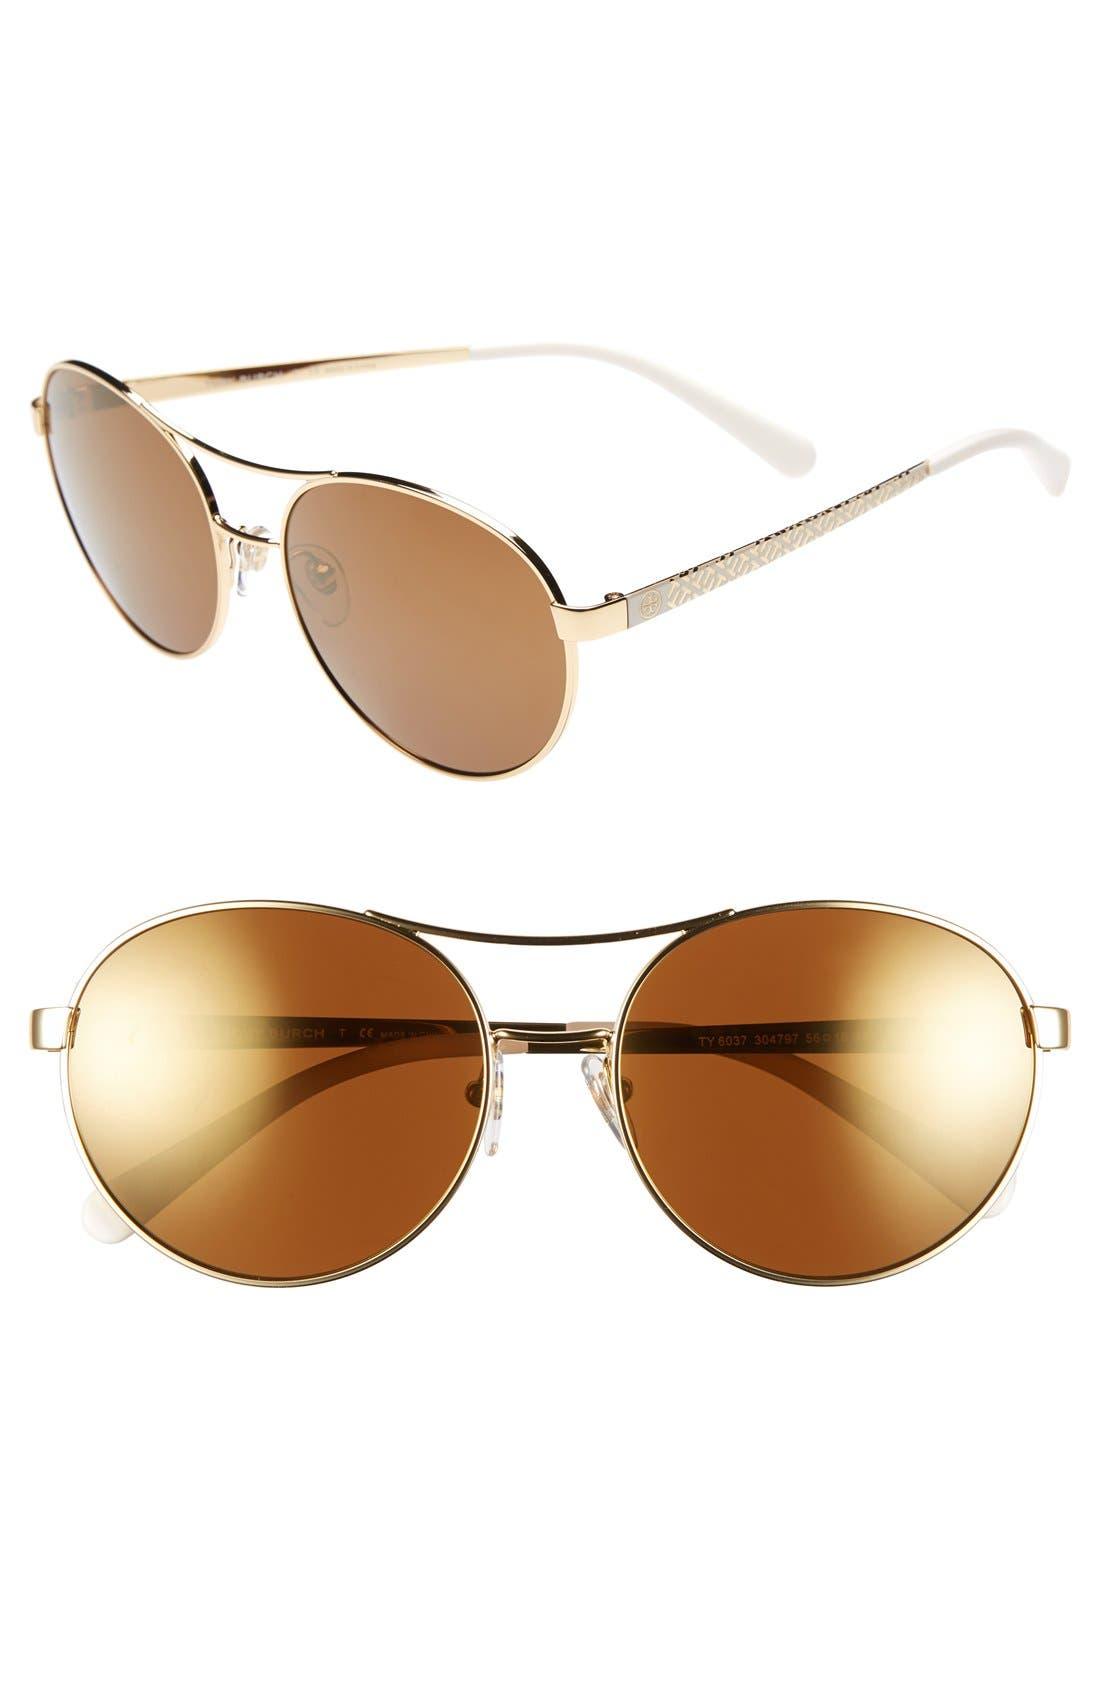 Main Image - Tory Burch 'M Round' 56mm Metal Sunglasses